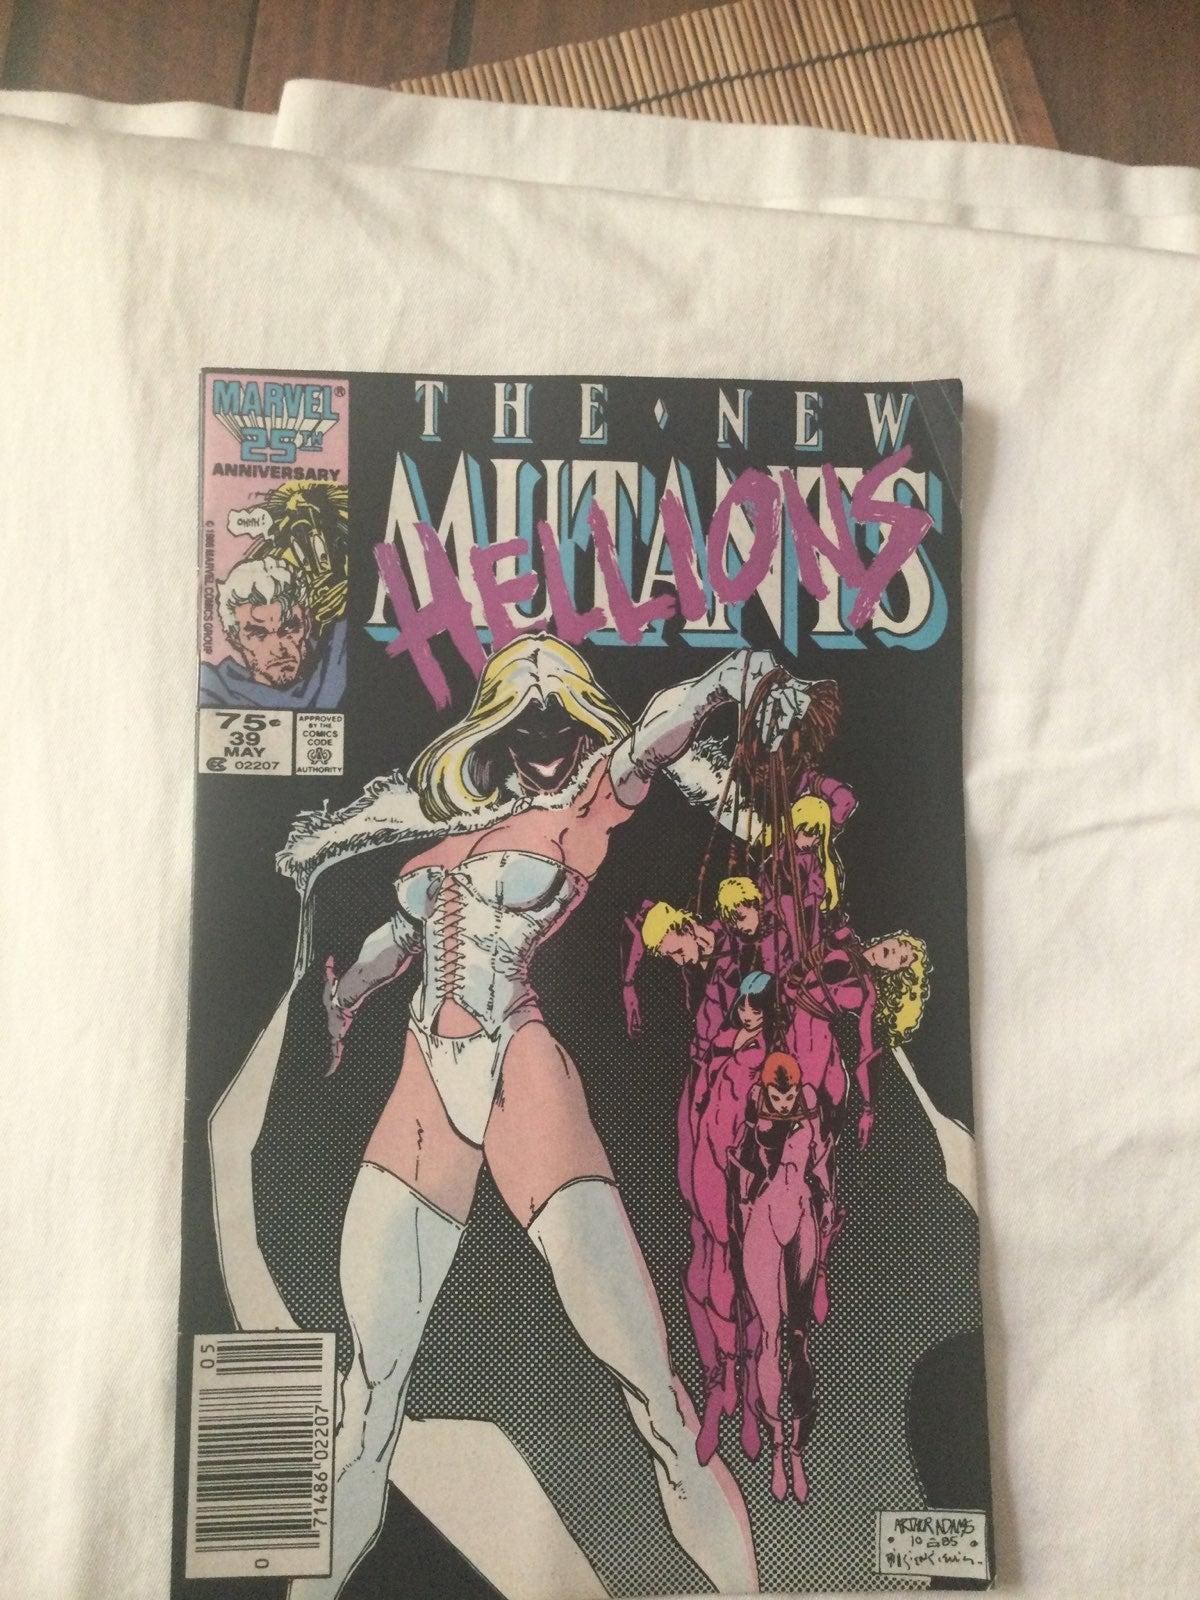 1985 marvel comics The New Mutants (Apri